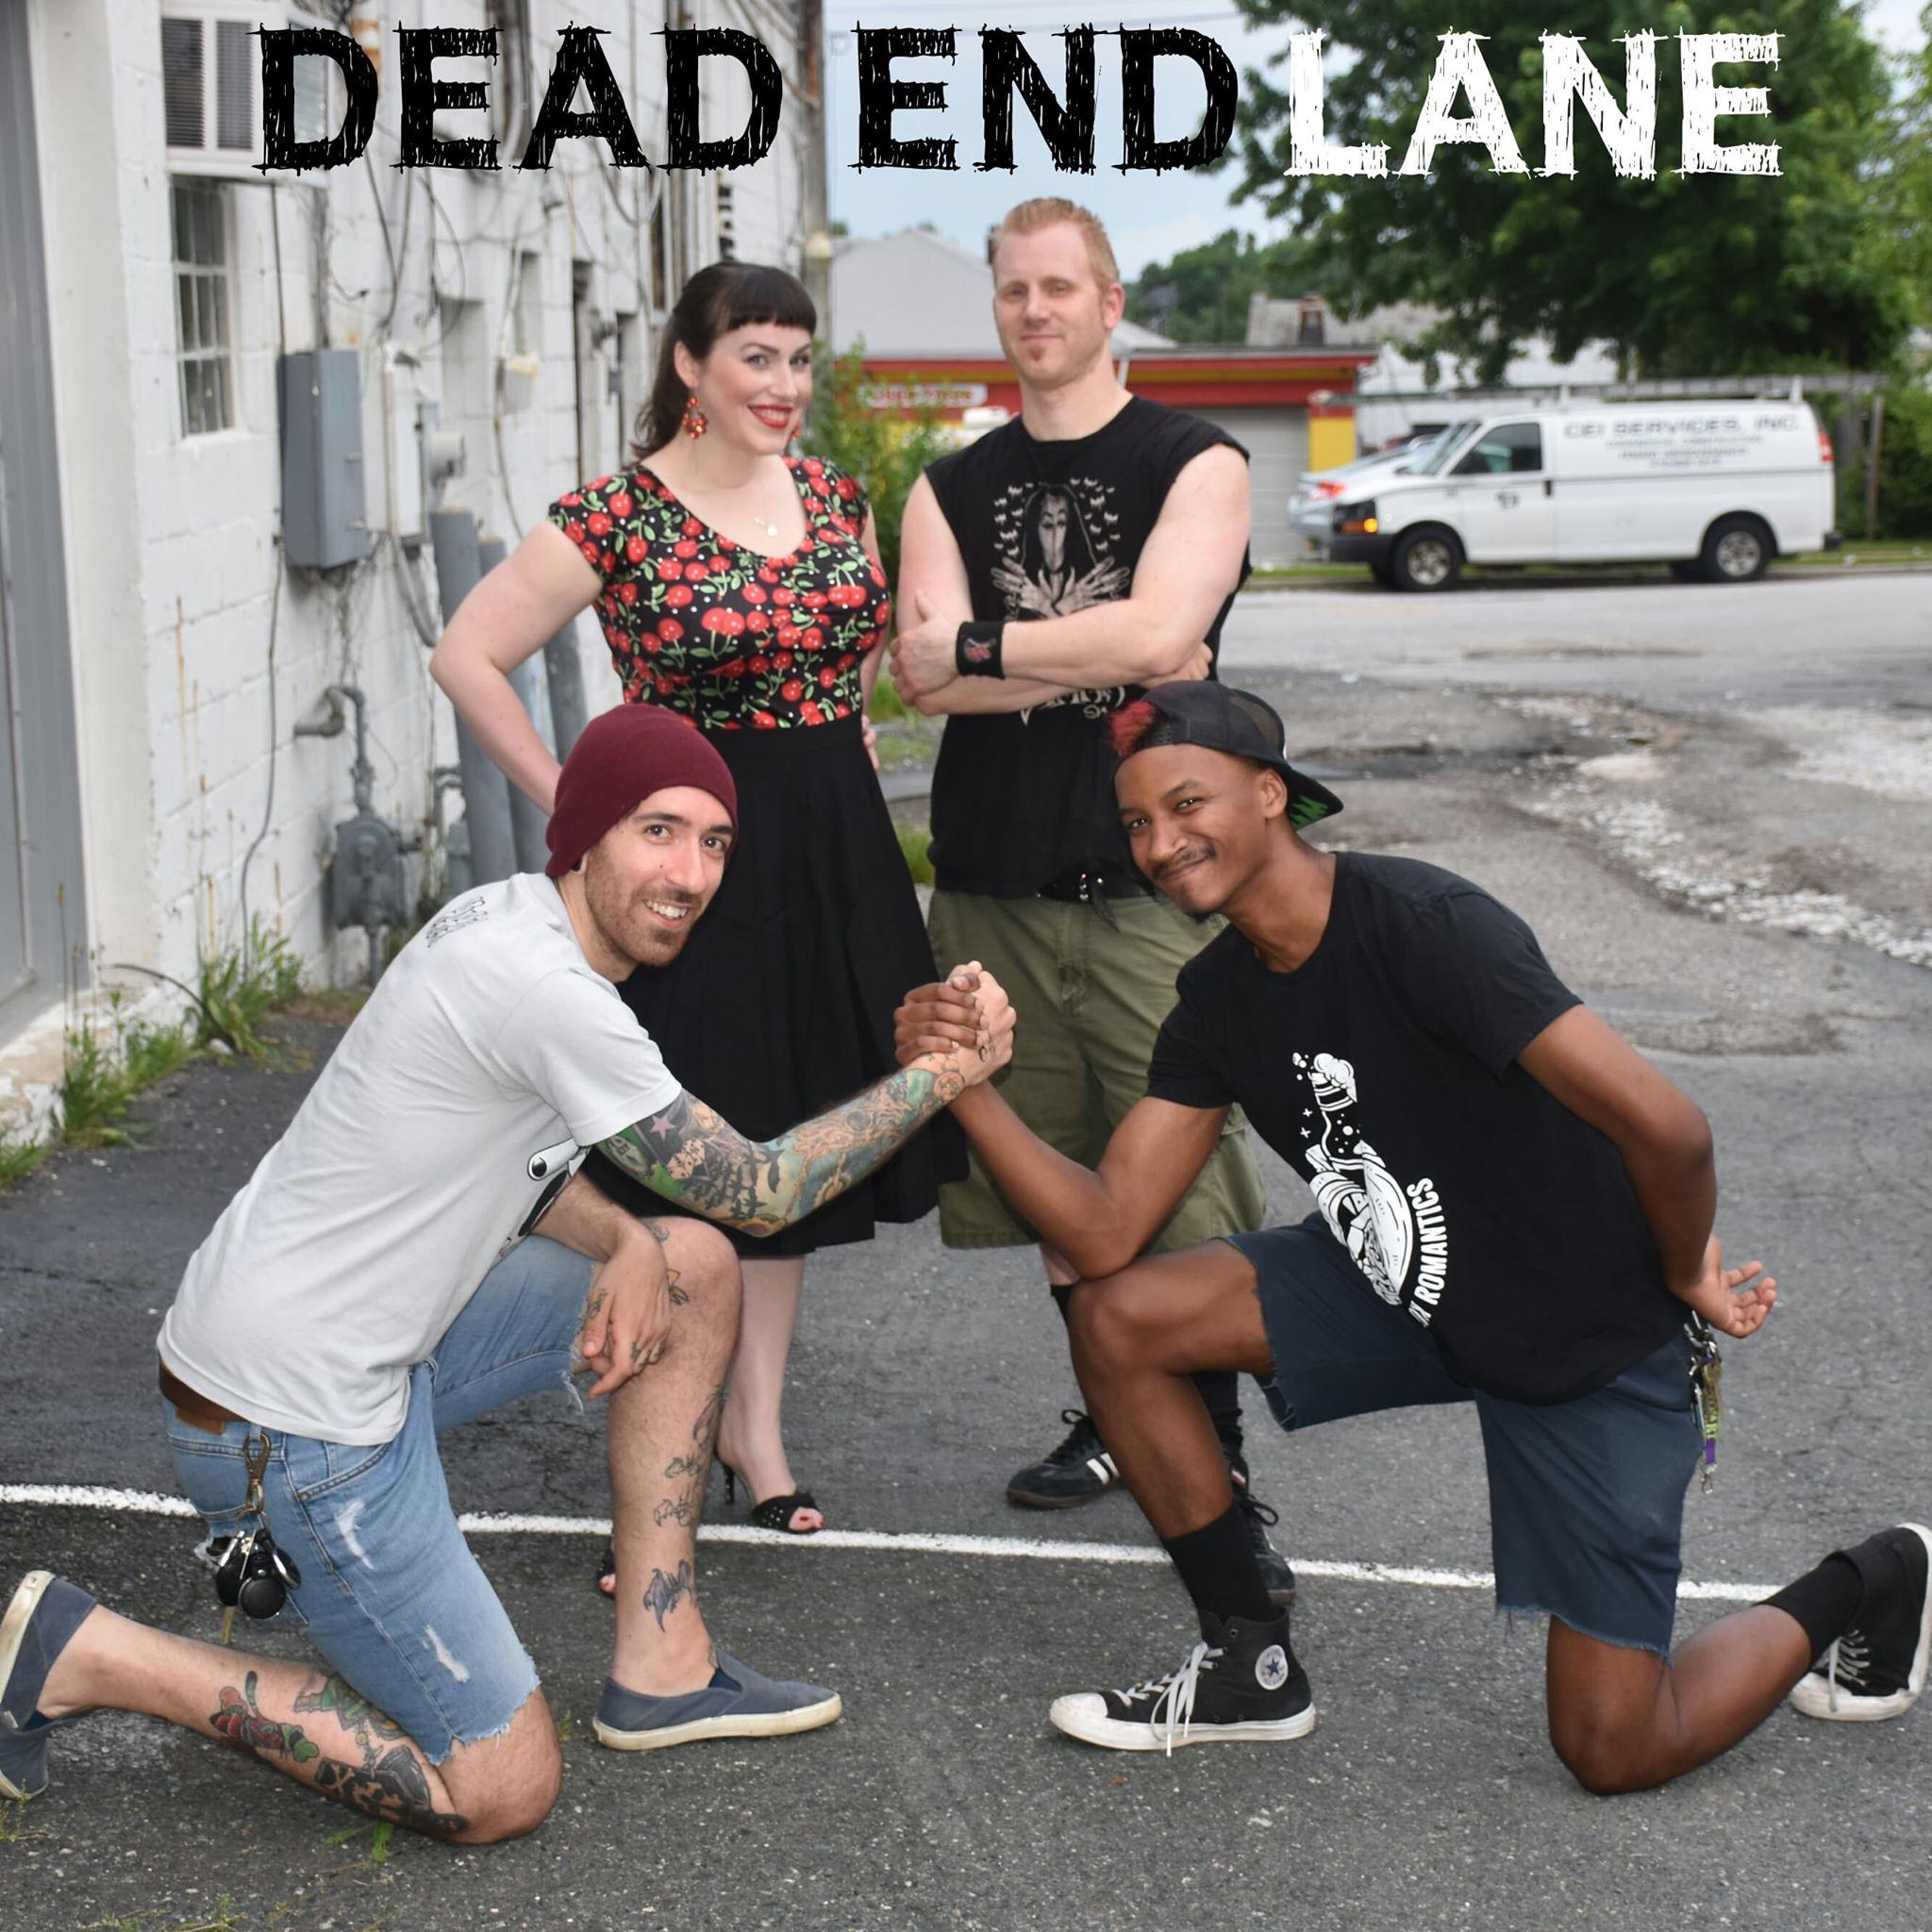 Dead End Lane, Baltimore MD